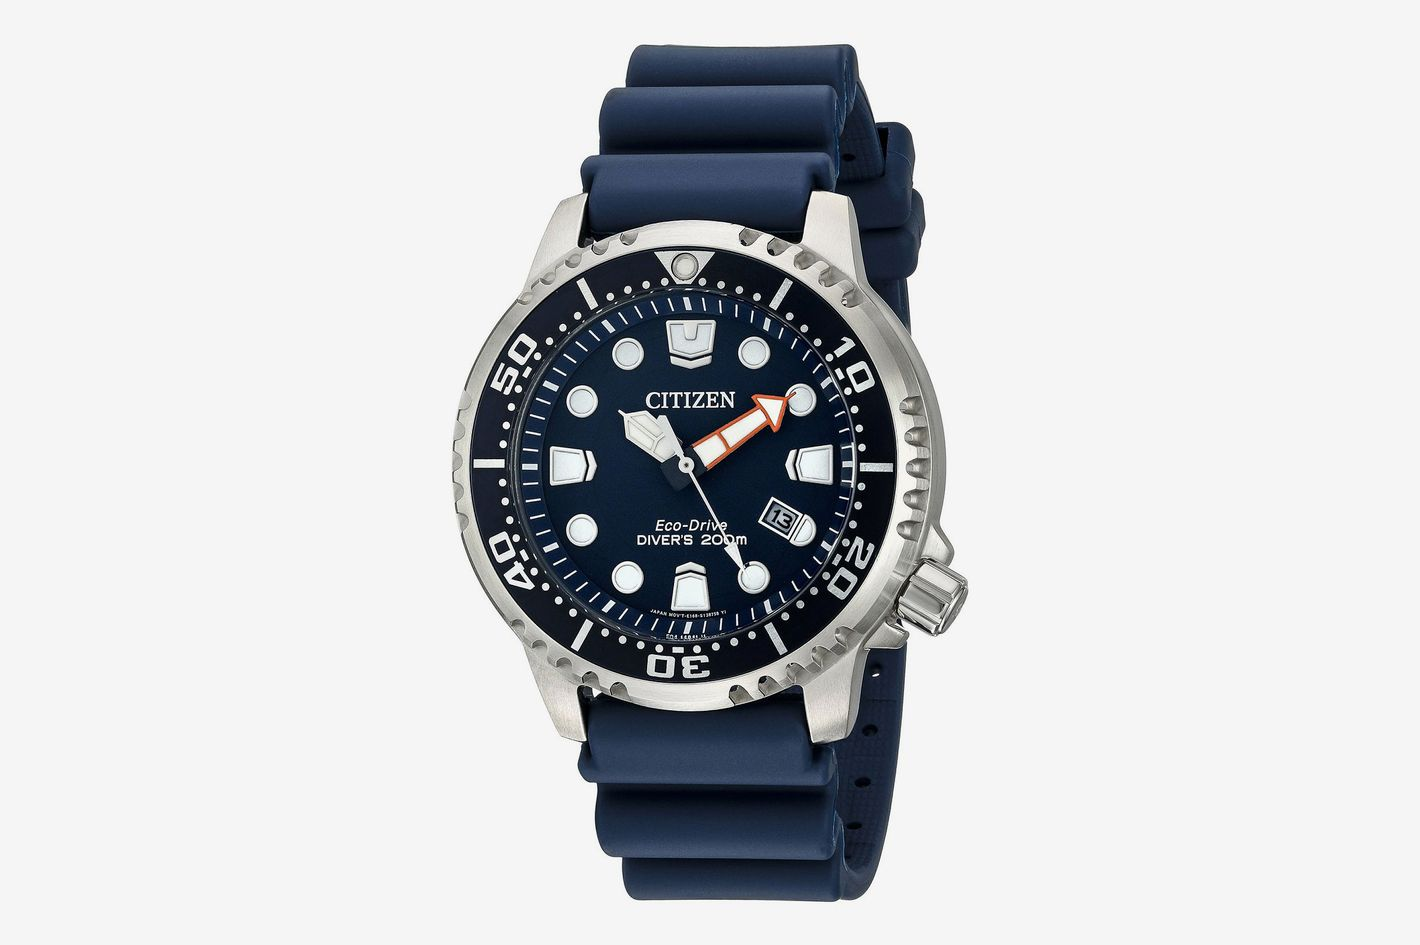 86ba9fb70aa Citizen Men s Eco-Drive Promaster Diver Watch